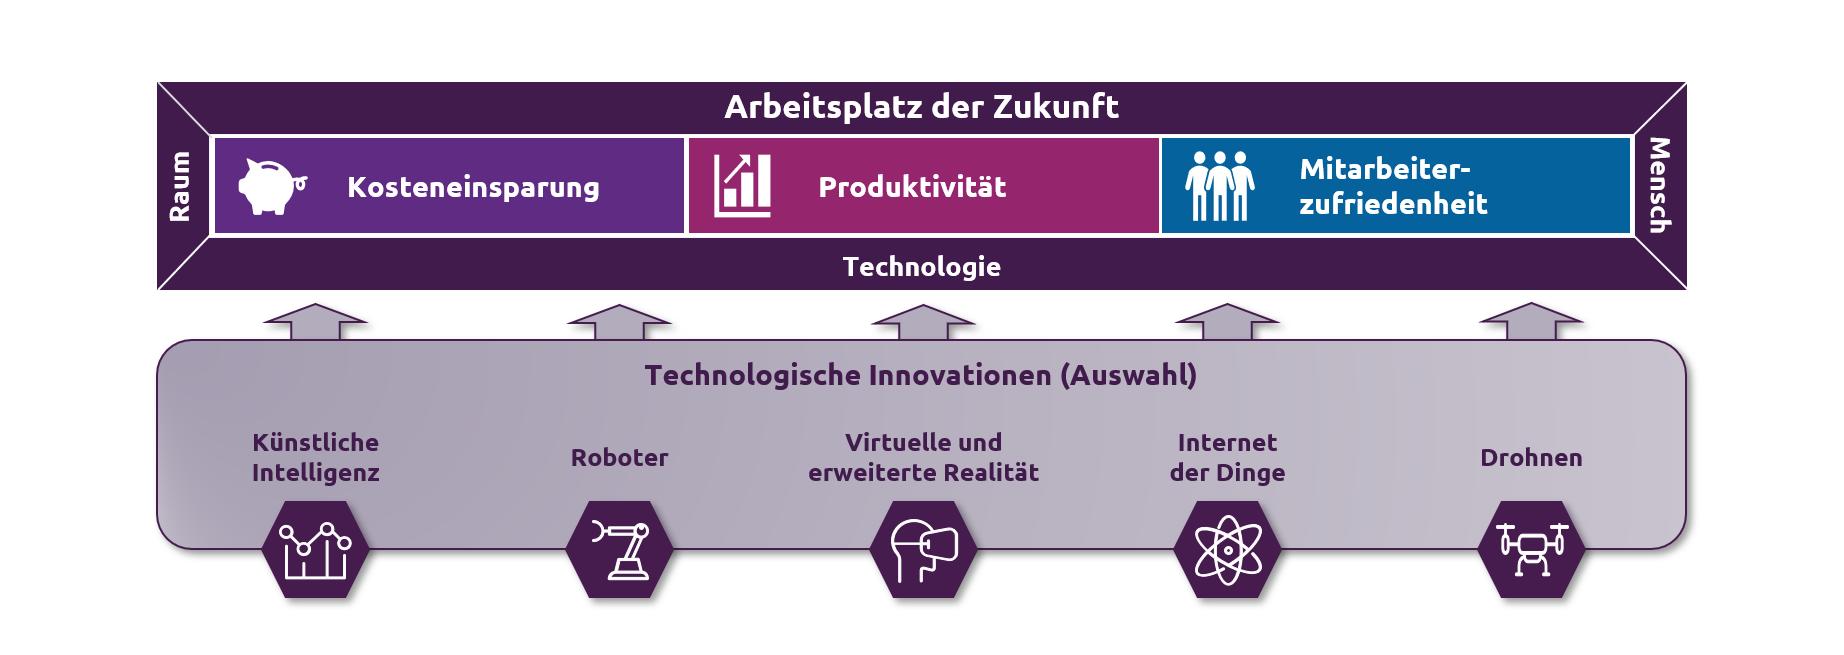 Innovationen-am-Arbeitsplatz-Framework_Capgemini-Invent